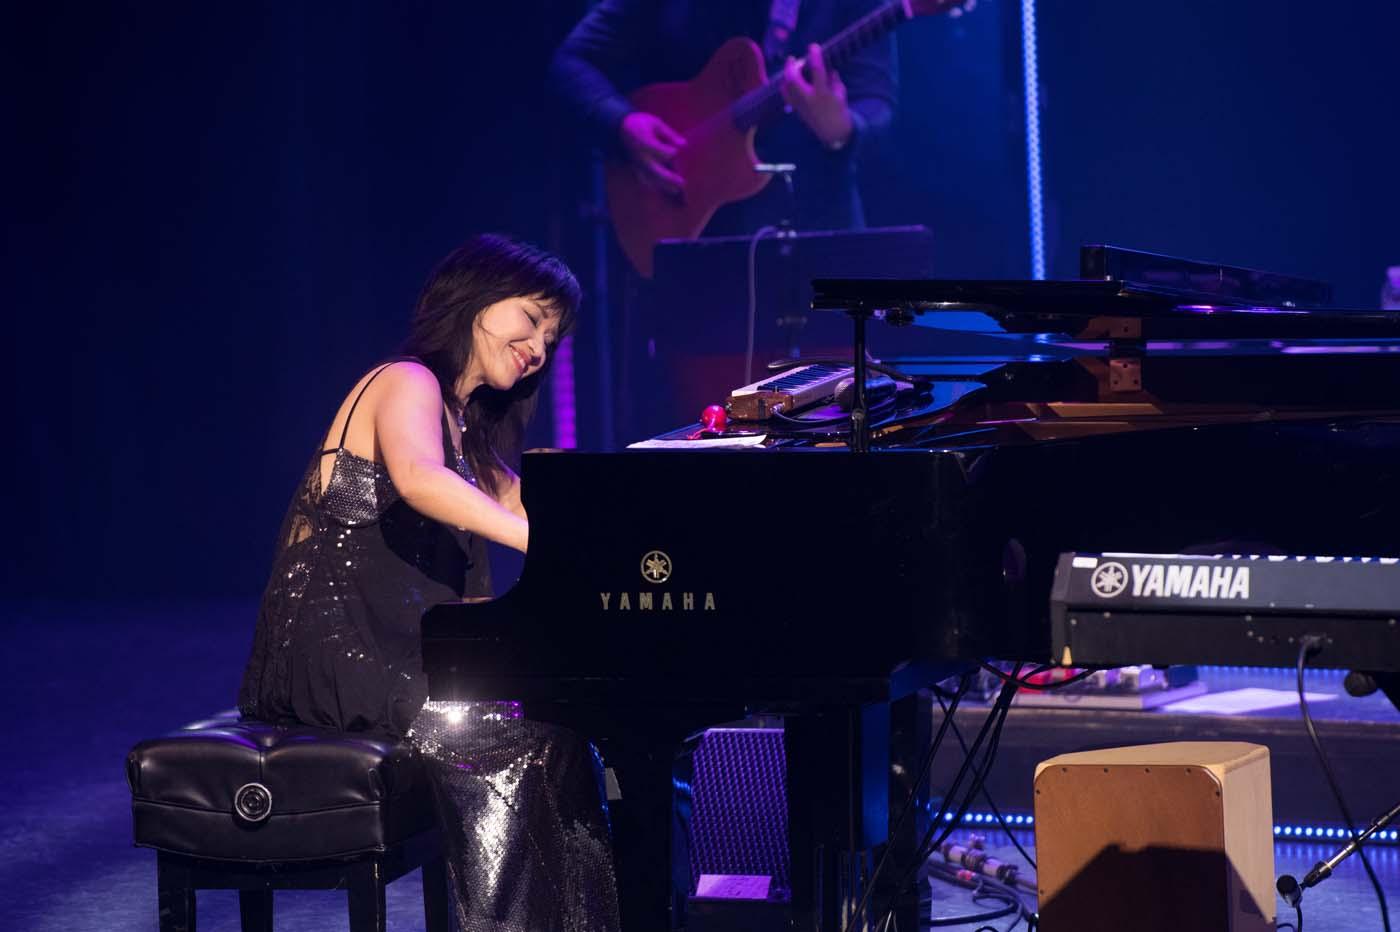 Keiko-Matsui-custom-piano-service-j-elliott-co-smooth-jazz-cruise